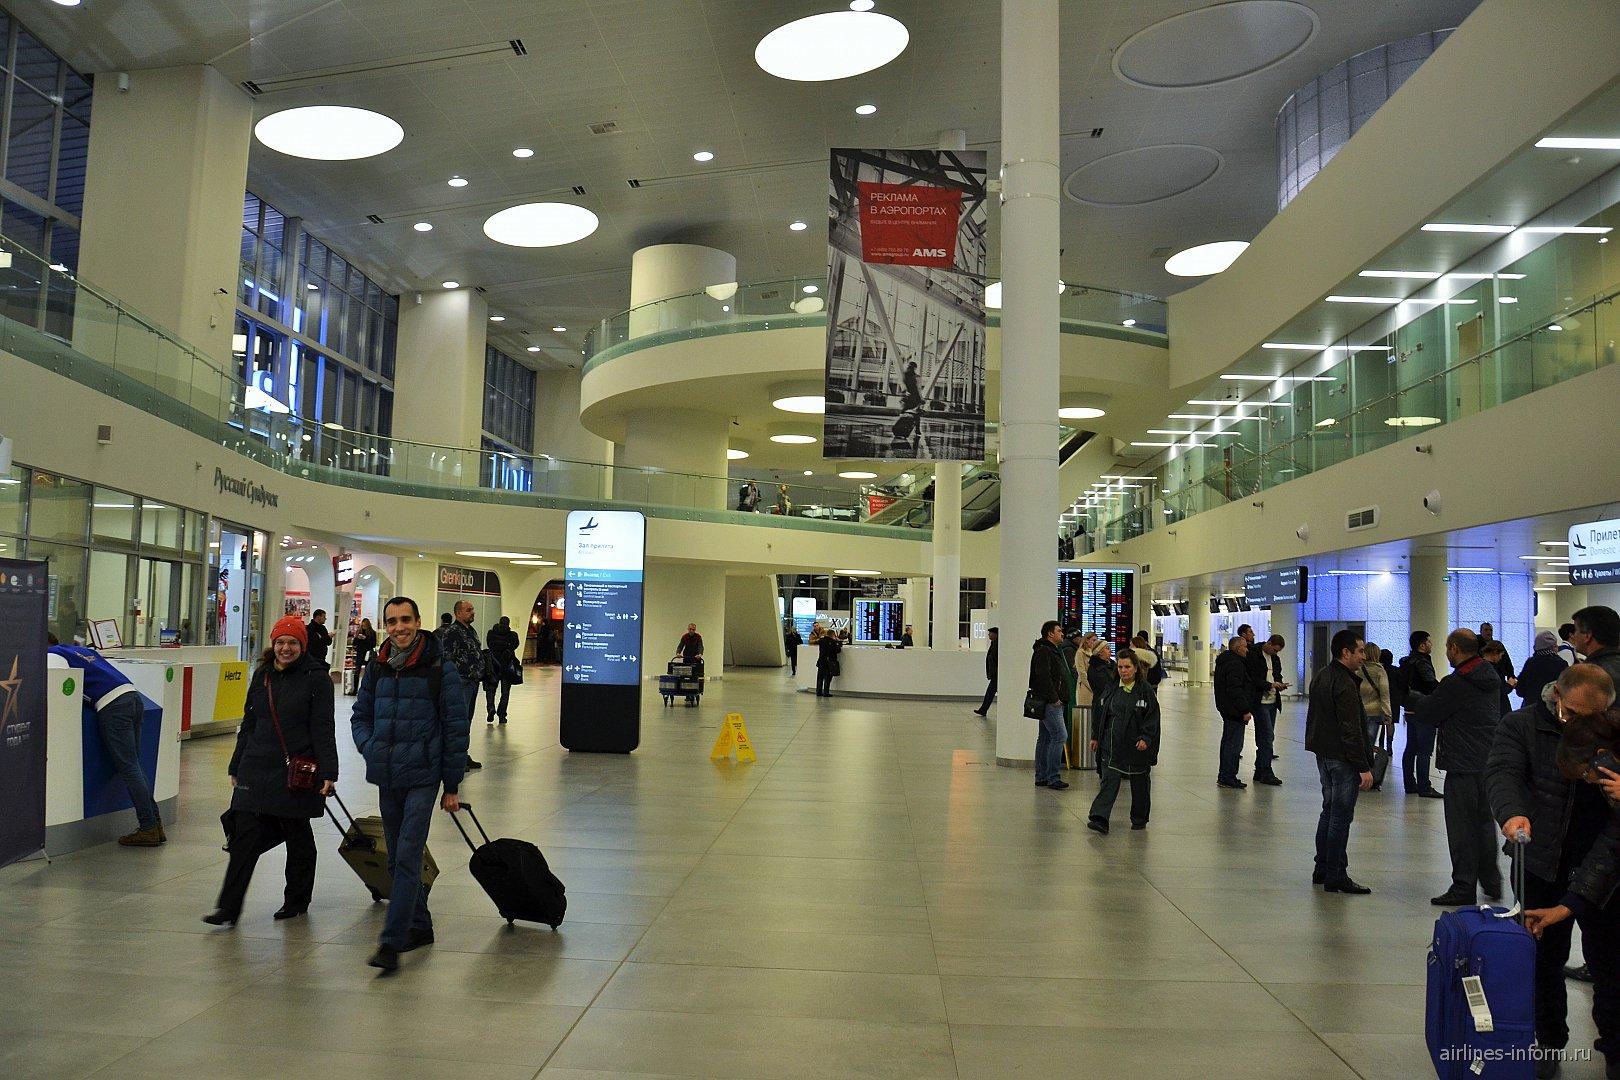 Зал прилета в аэропорту Самара Курумоч